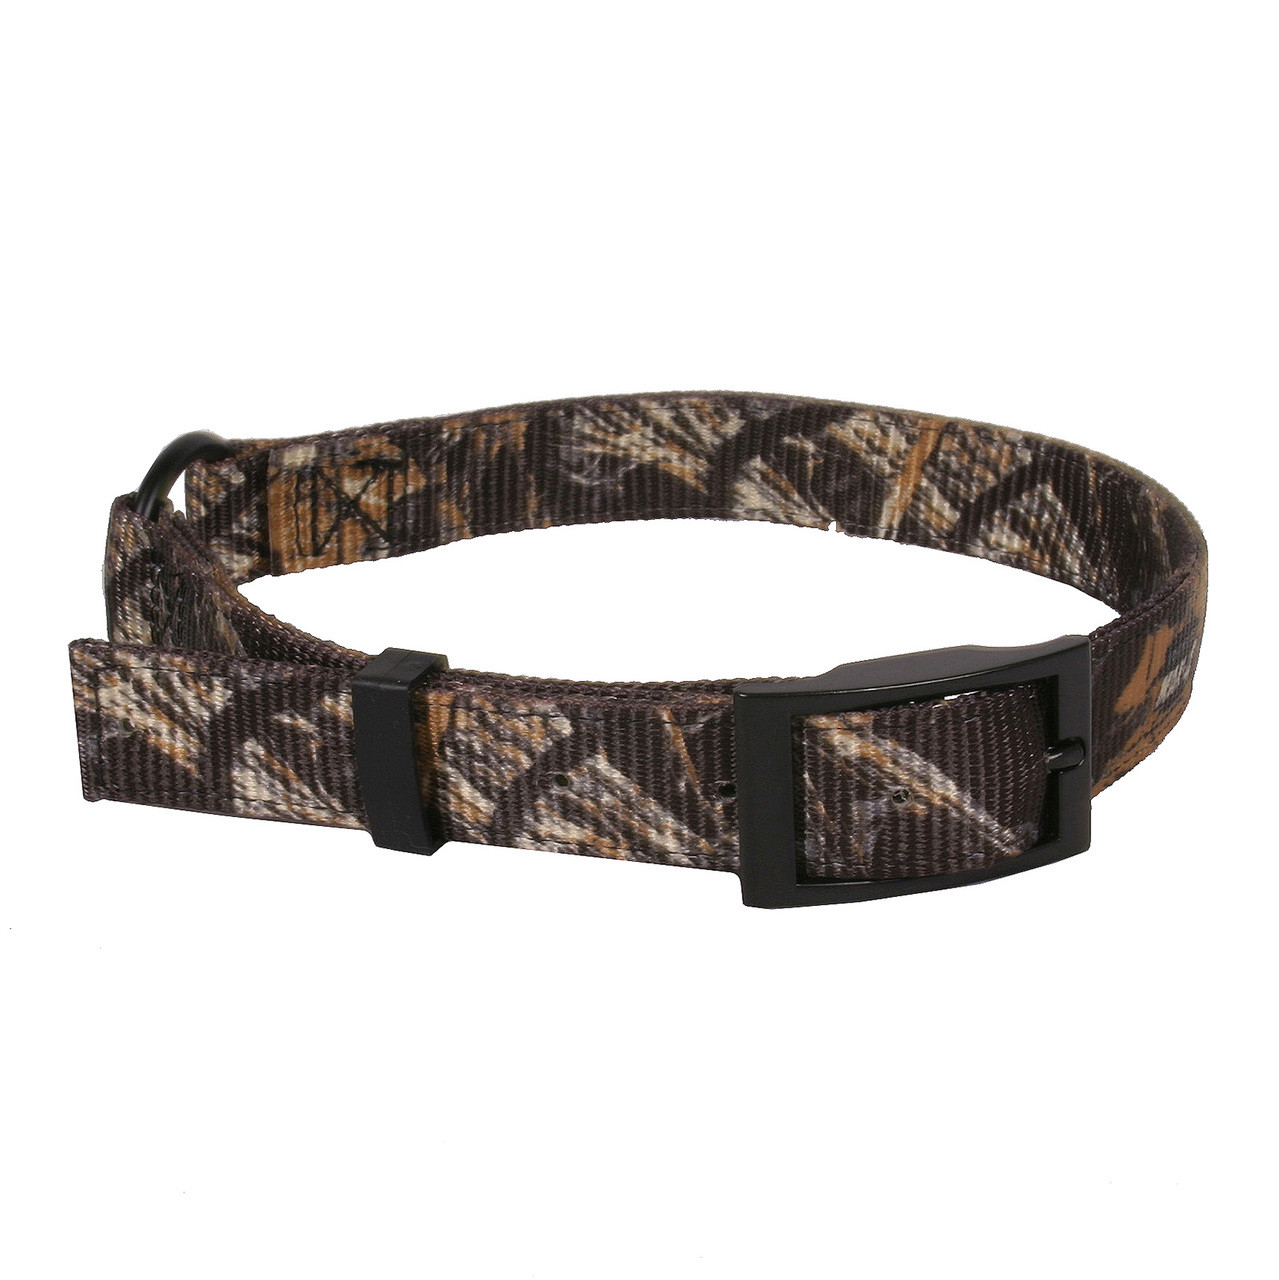 University of South Carolina Nylon Adjustable Dog Collar